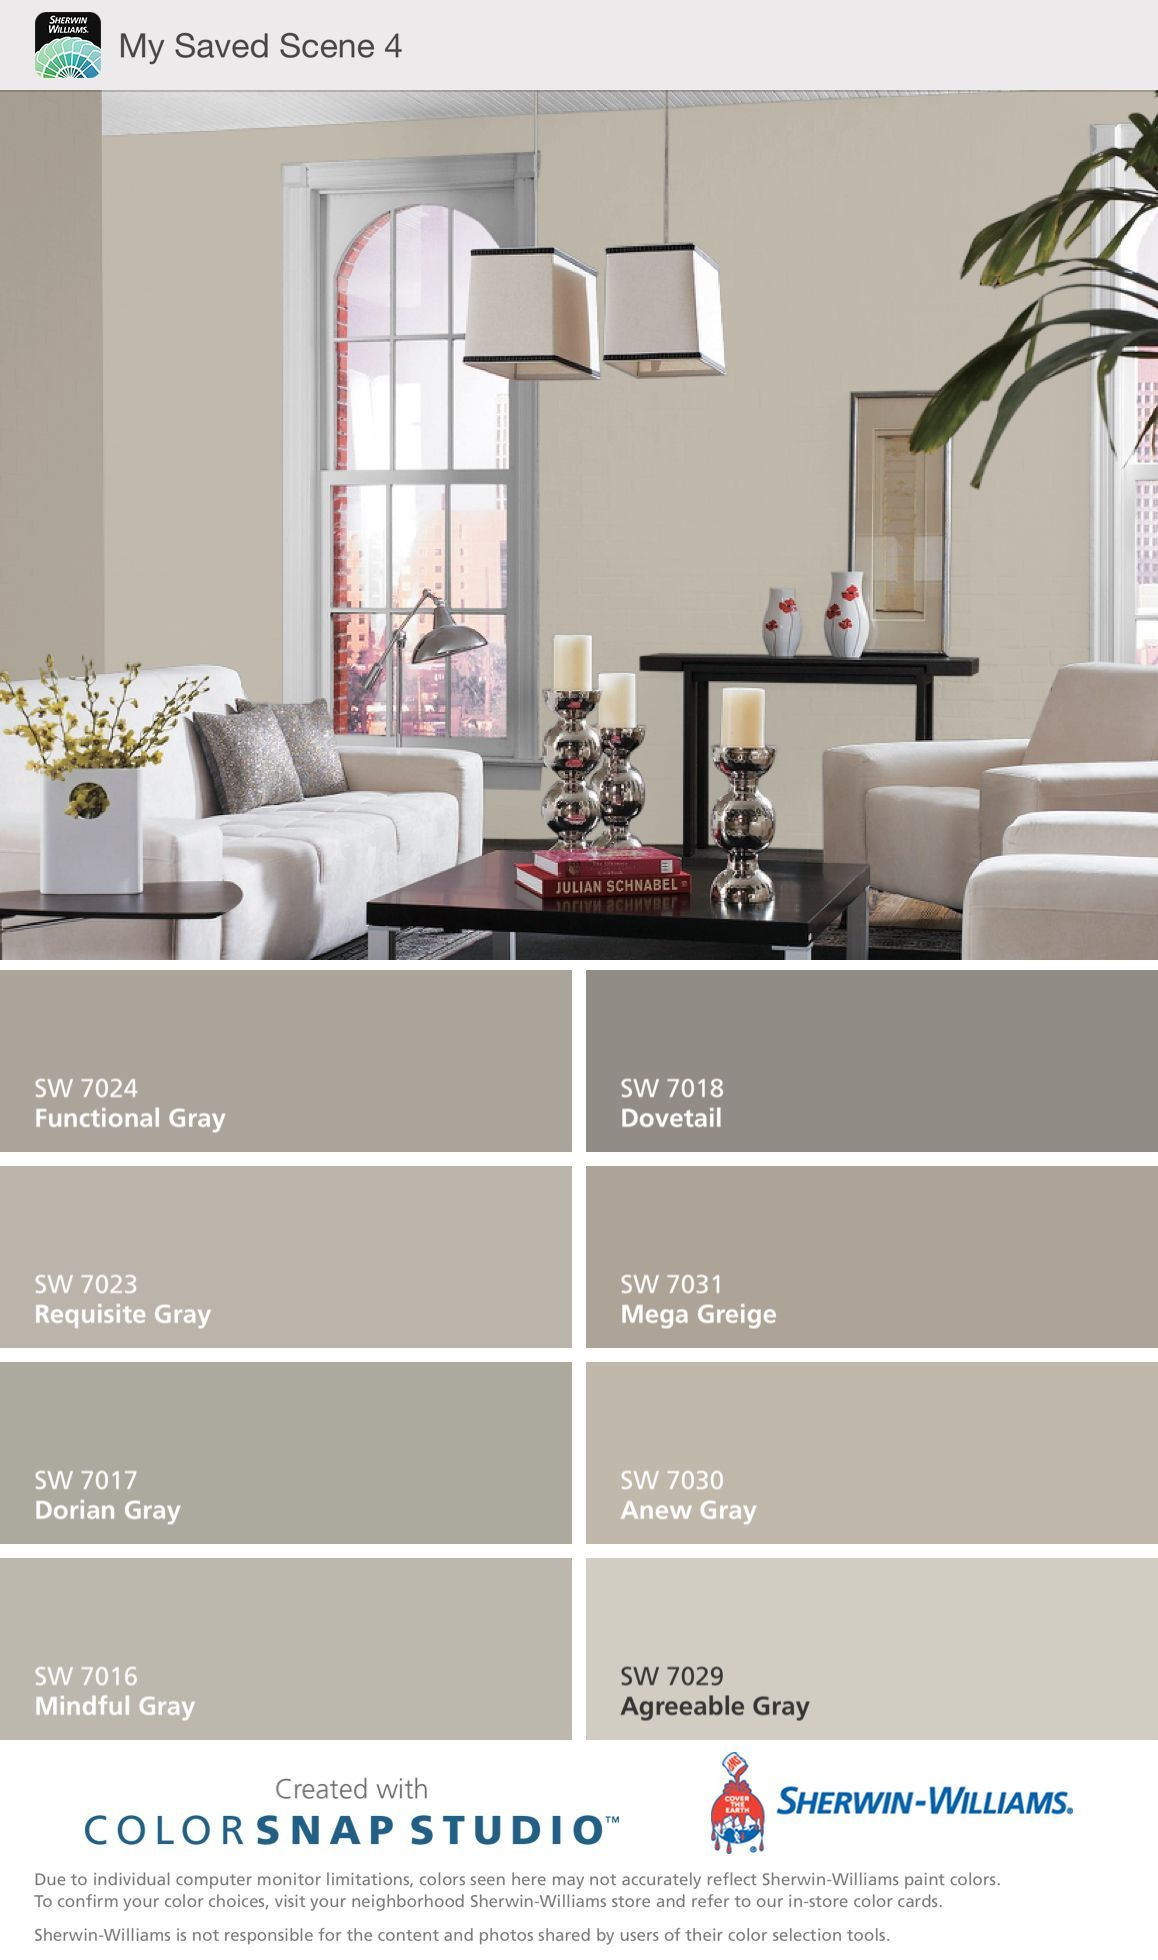 Marvelous Wand Gestaltung, Farbgestaltung, Wandfarbe Farbtöne, Wandfarben,  Farbpaletten, Graue Wände, Geige, Neutrale Farbe, Farbenlehre